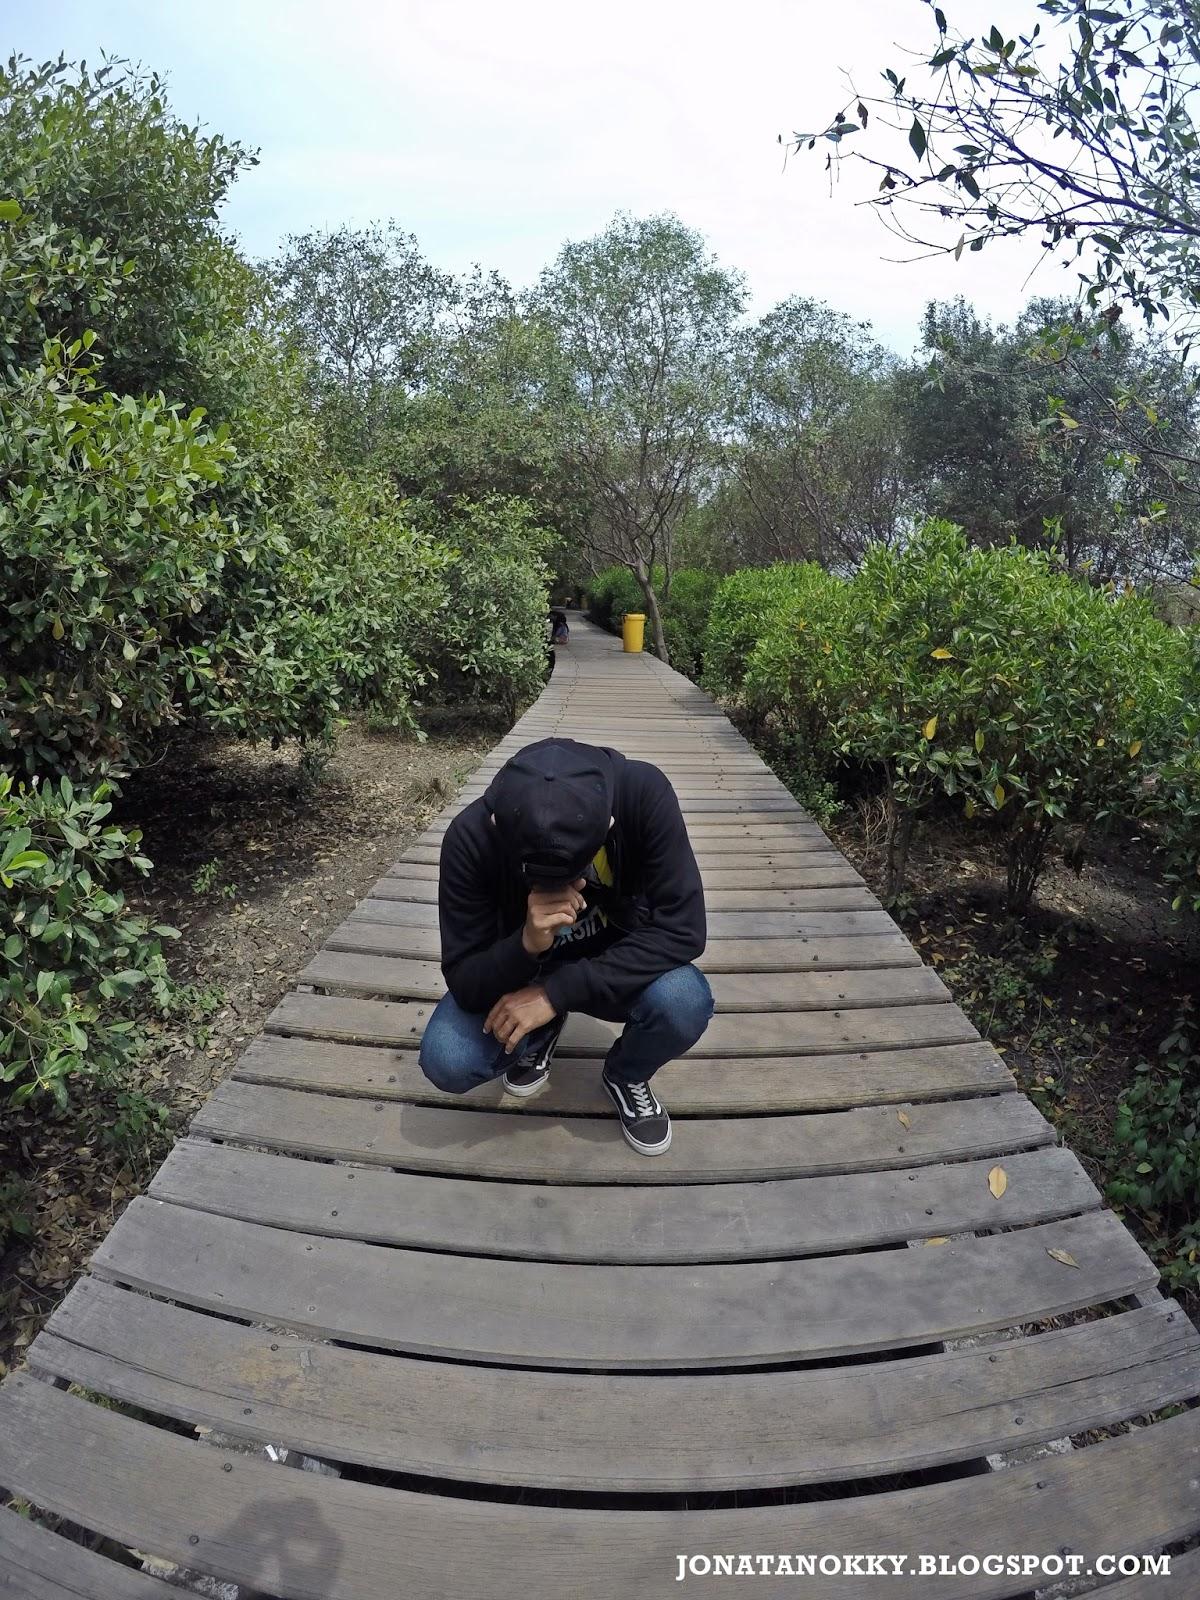 Menikmati Hijaunya Hutan Mangrove Kota Metropolitan Jonatan Okky Sebagai Kedua